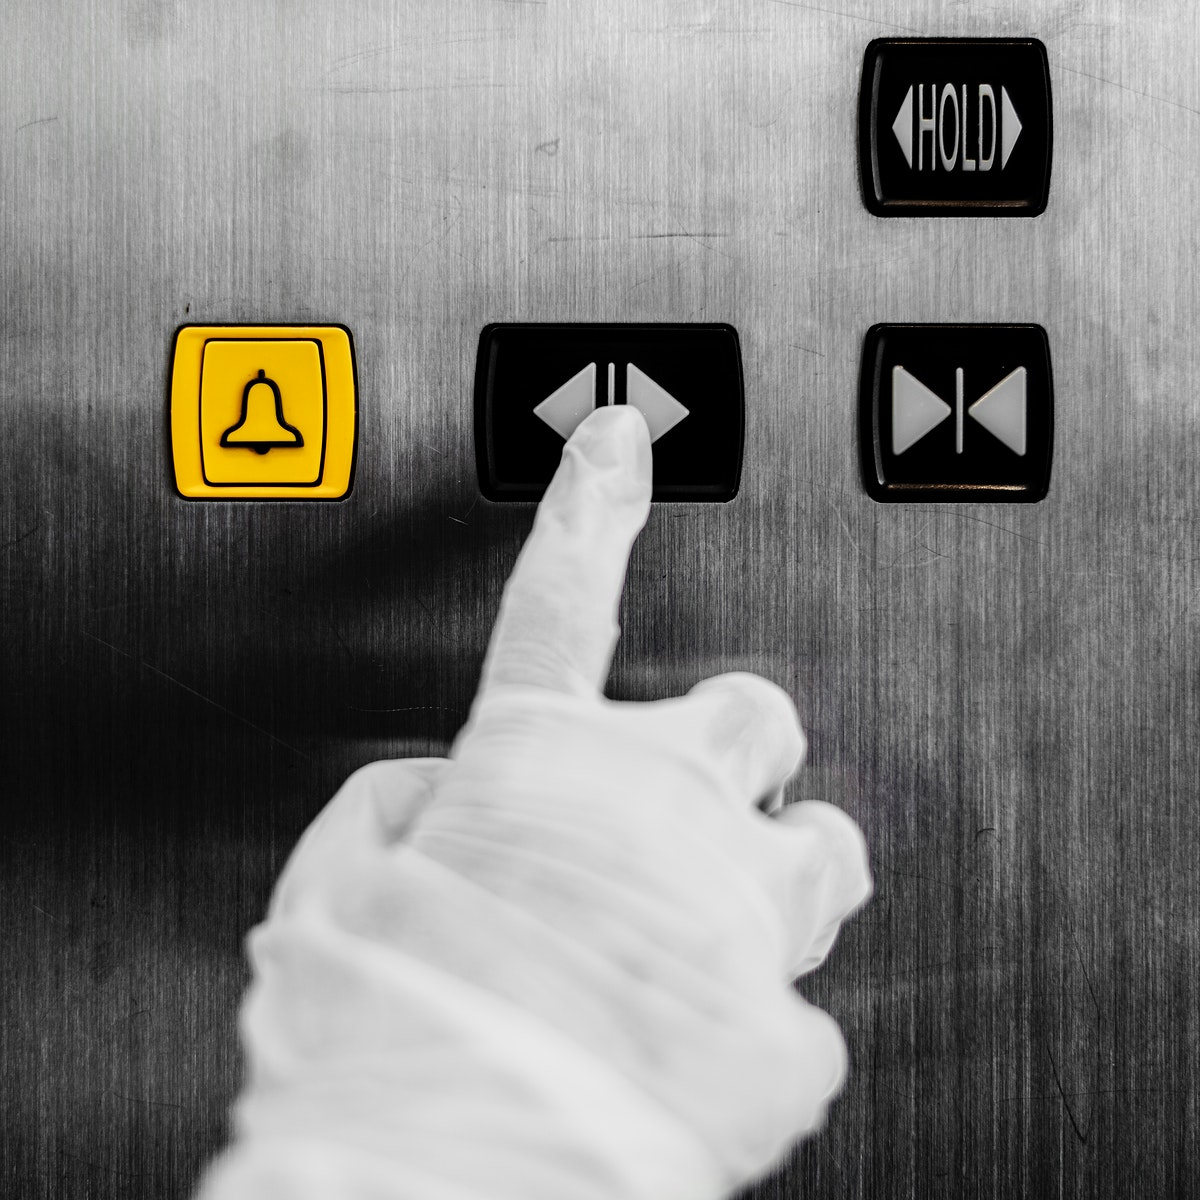 Gloved hand pressing an elevator button to prevent coronavirus contamination